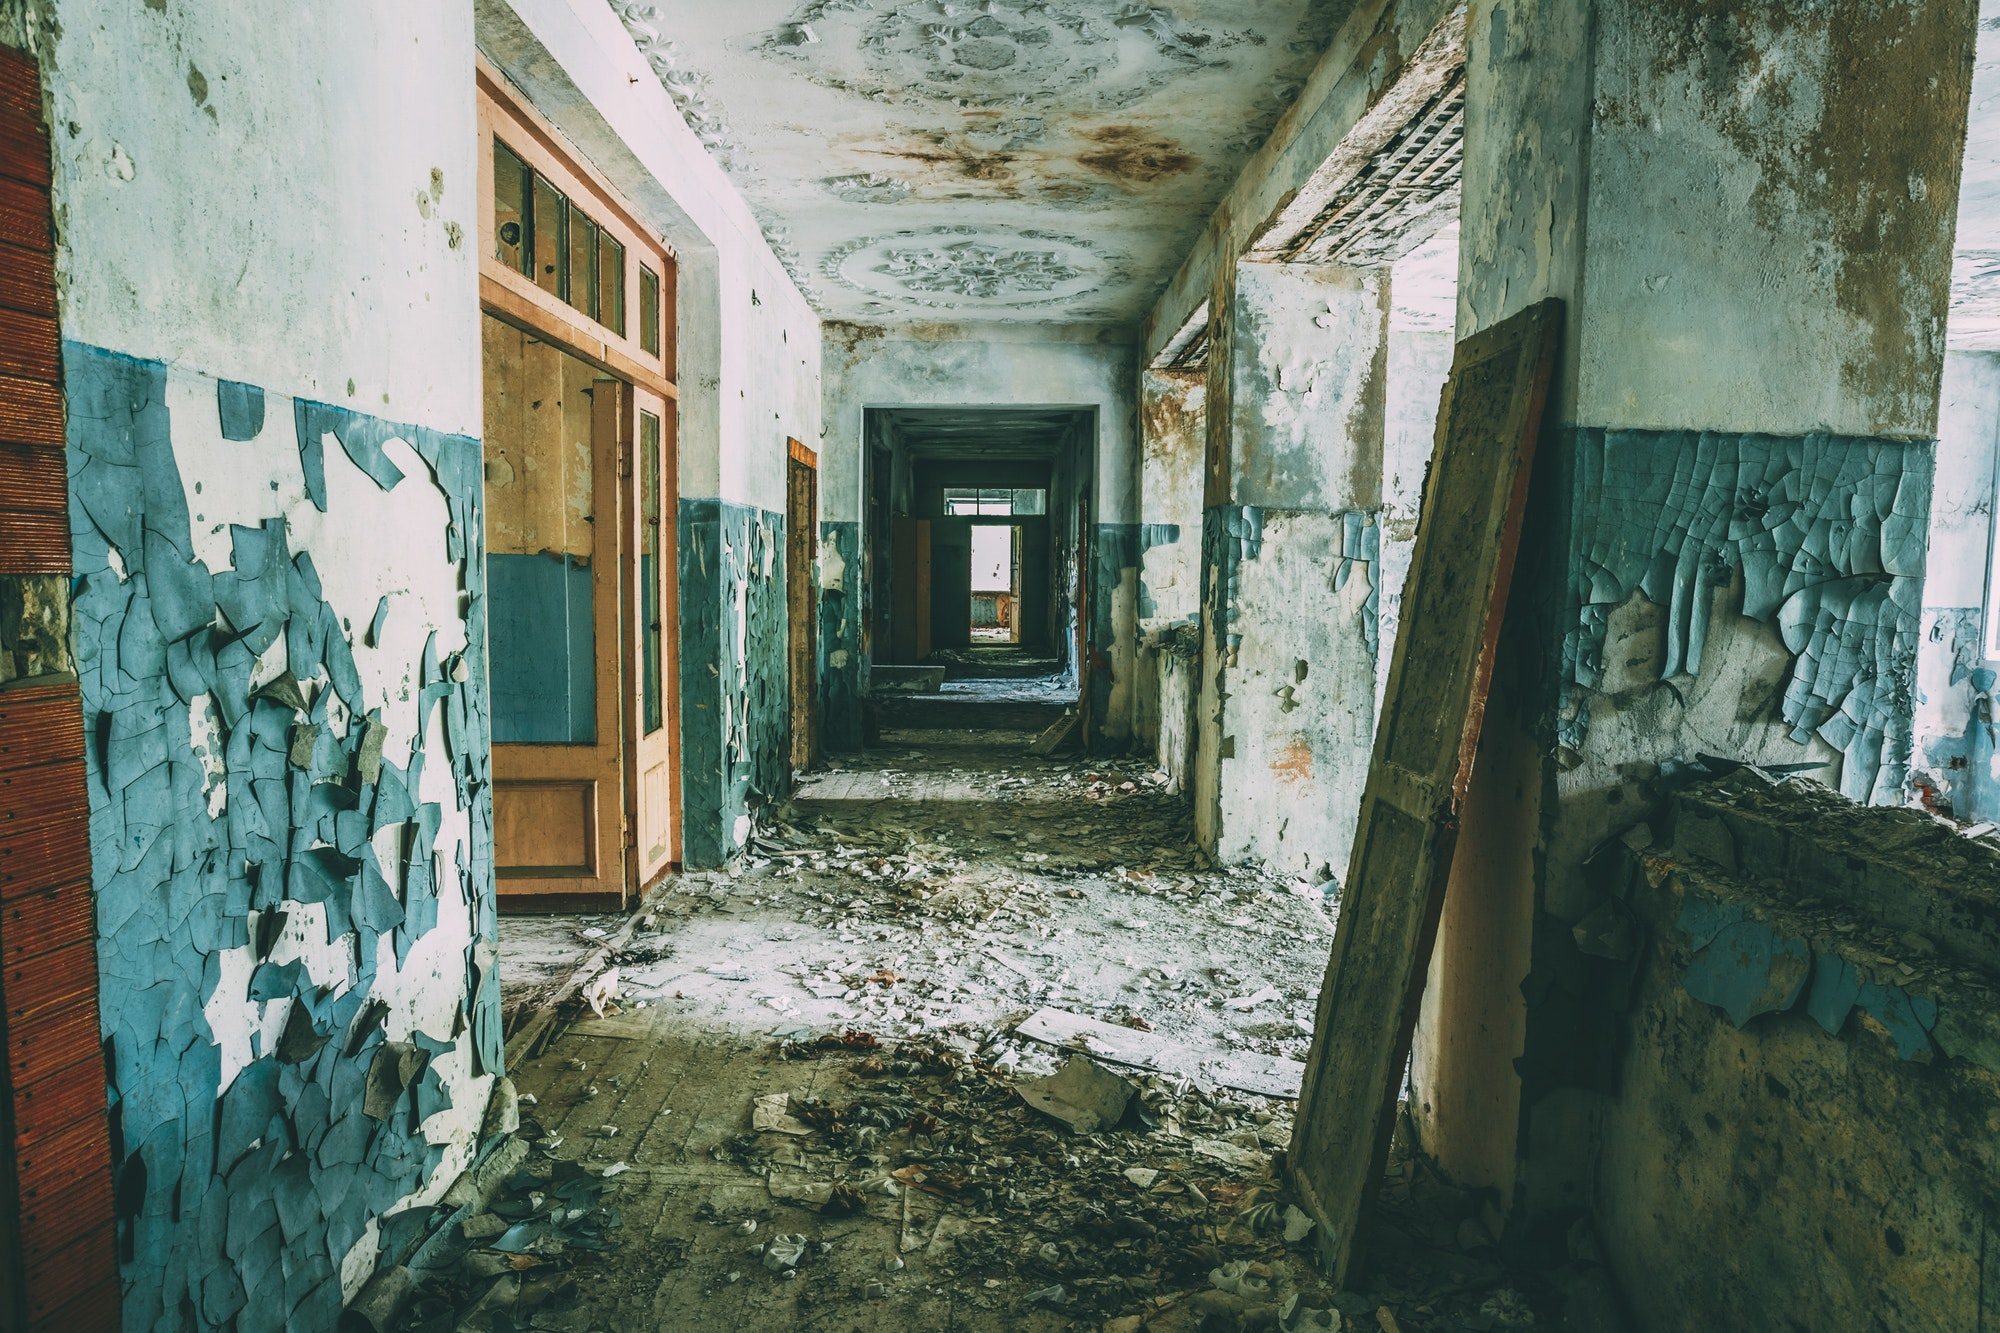 at. Chernobyl Disaster